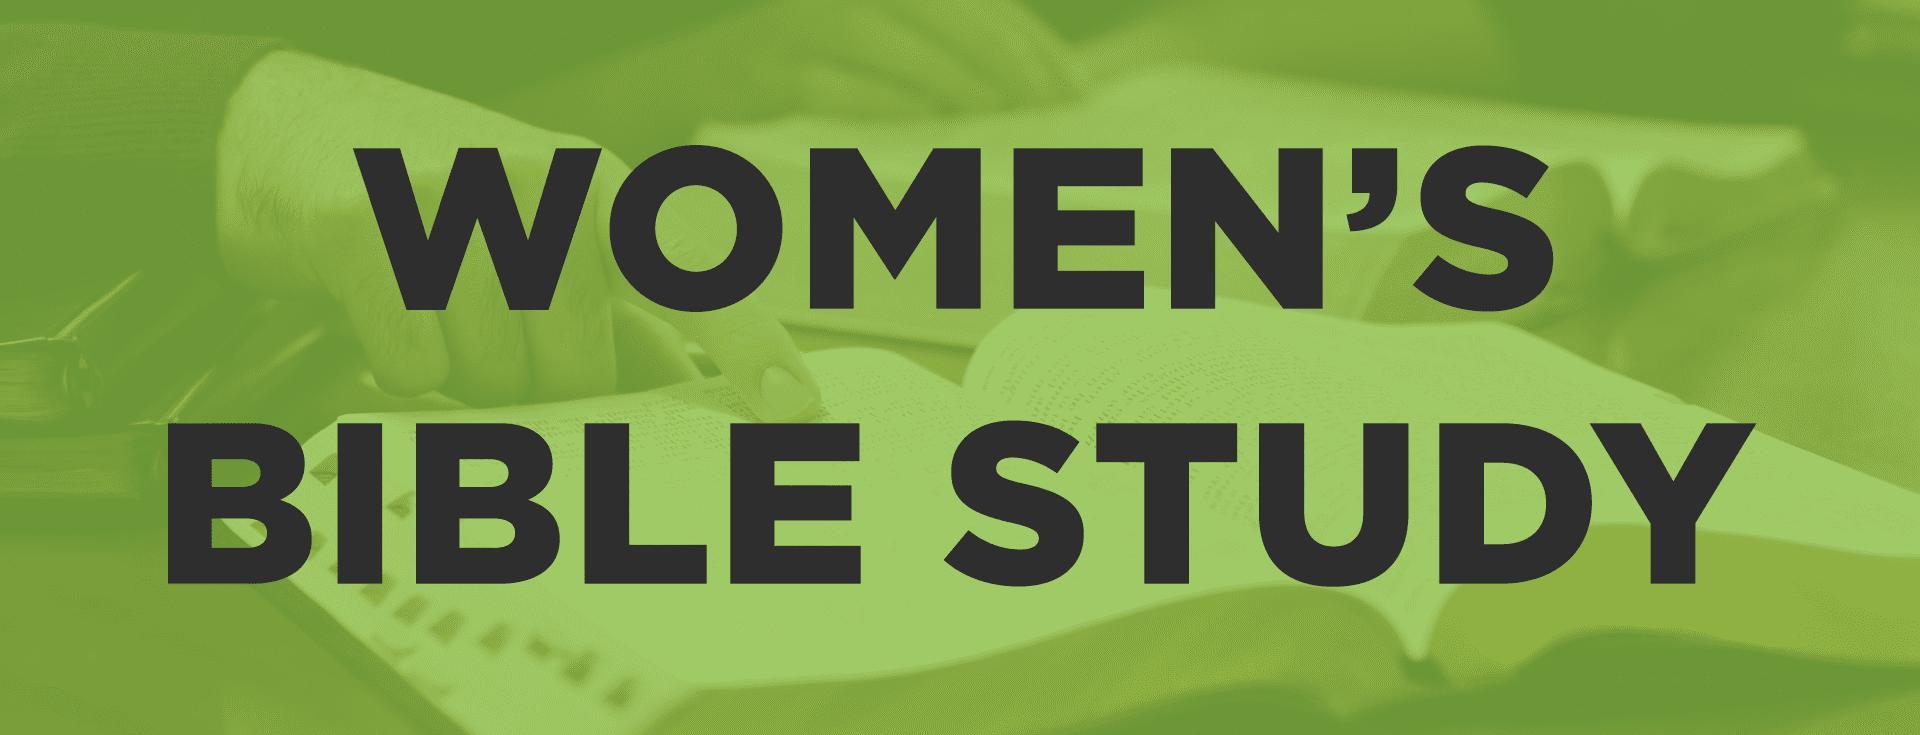 Women's Bible Study - Mobile